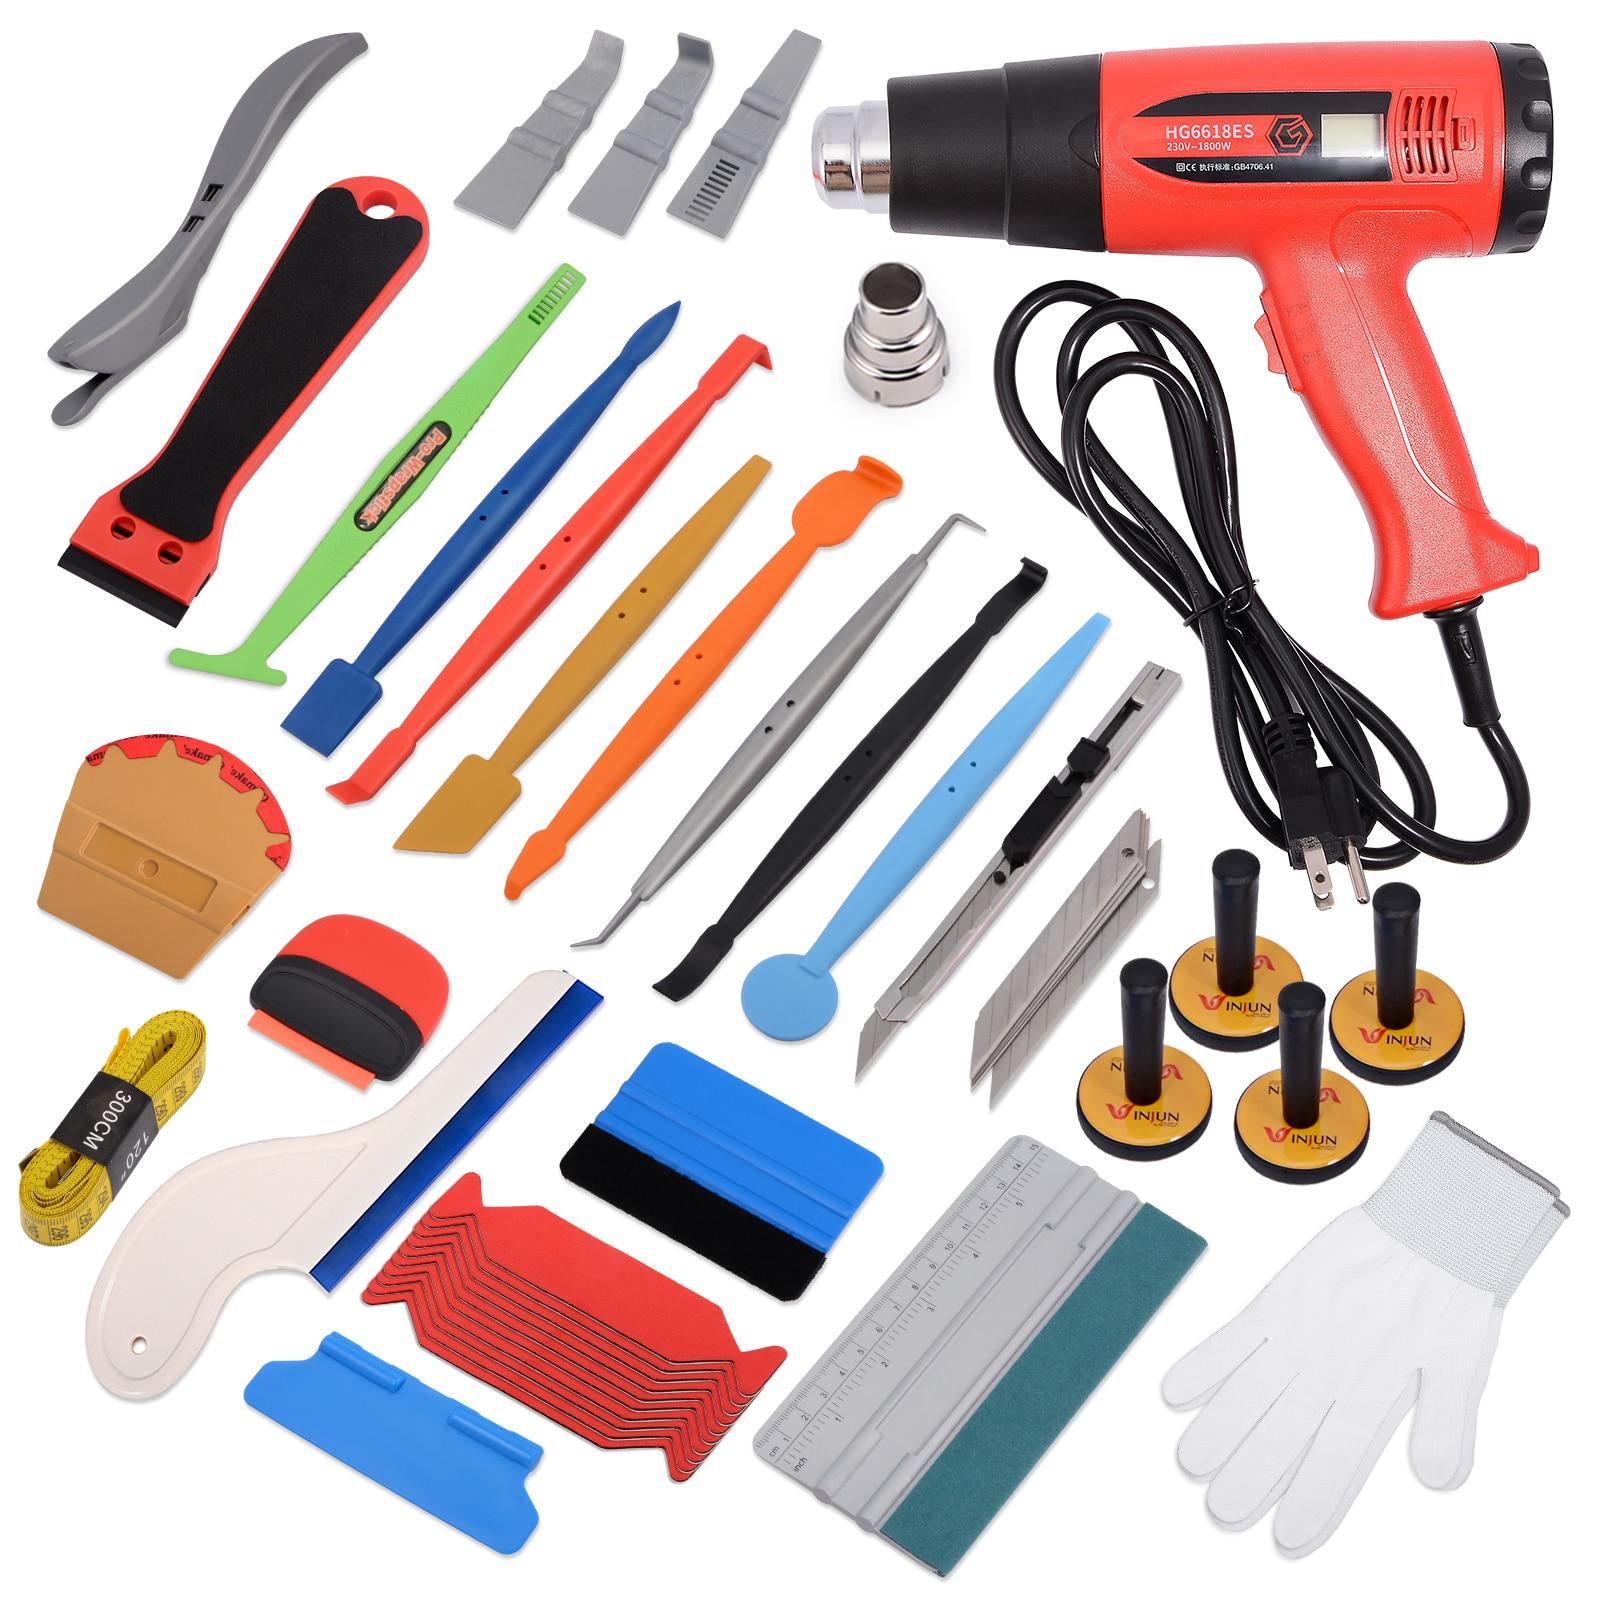 FOSHIO Window Tint Tools Kit With US/EU Plug Hot Air Gun Vinyl Car Wrap Squeegee Scraper Sticker Film Cutter Knife Tool Set